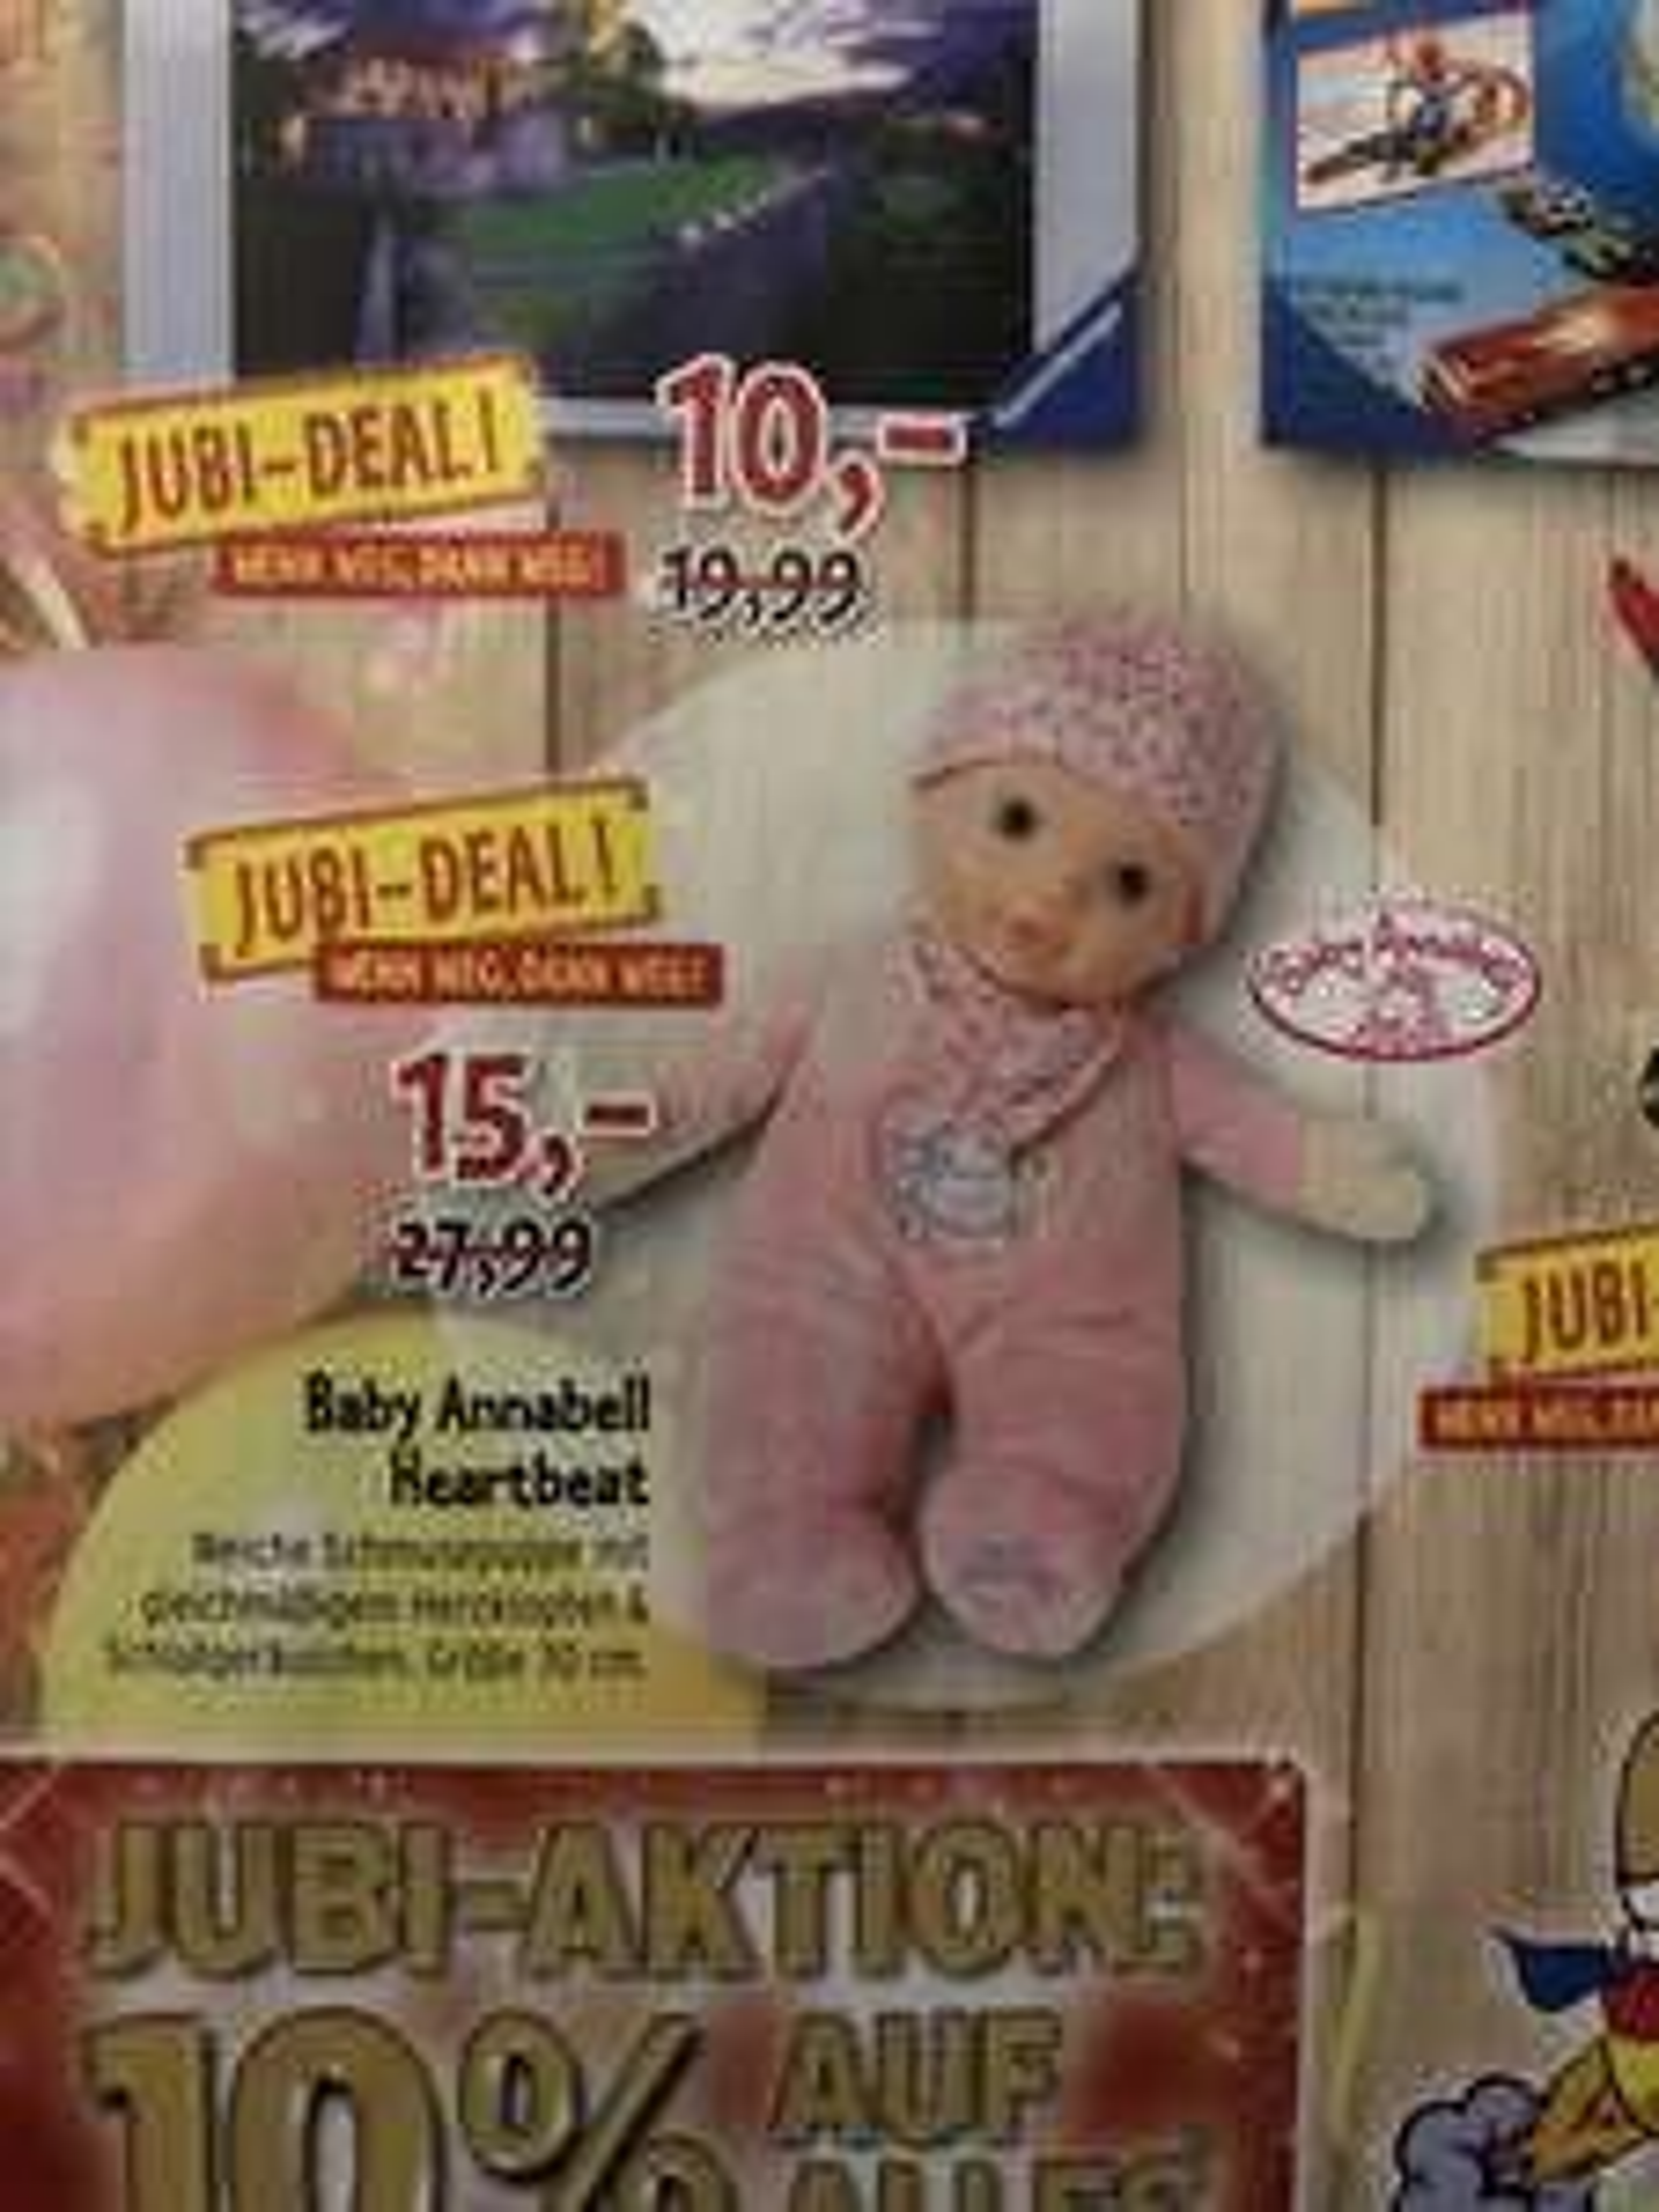 Teddy Toys 10% auf ALLES: z.B. Baby Annabell Heartbeat